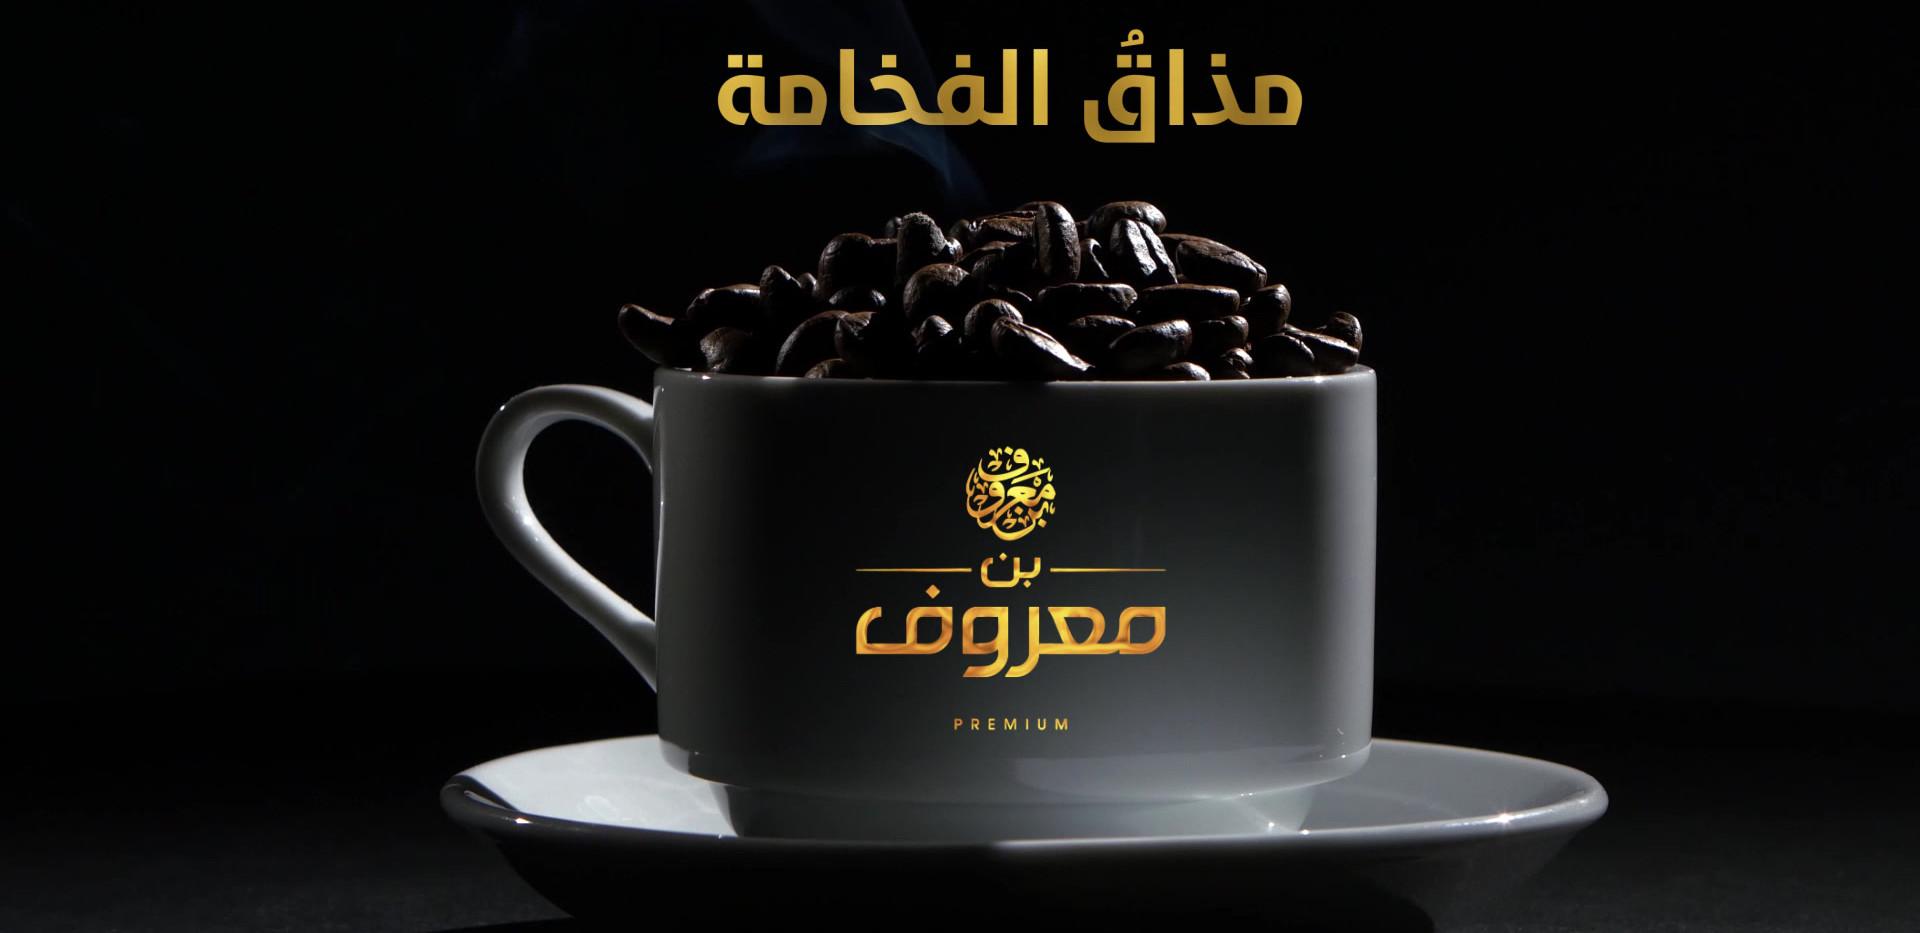 Marouf-video1.mp4